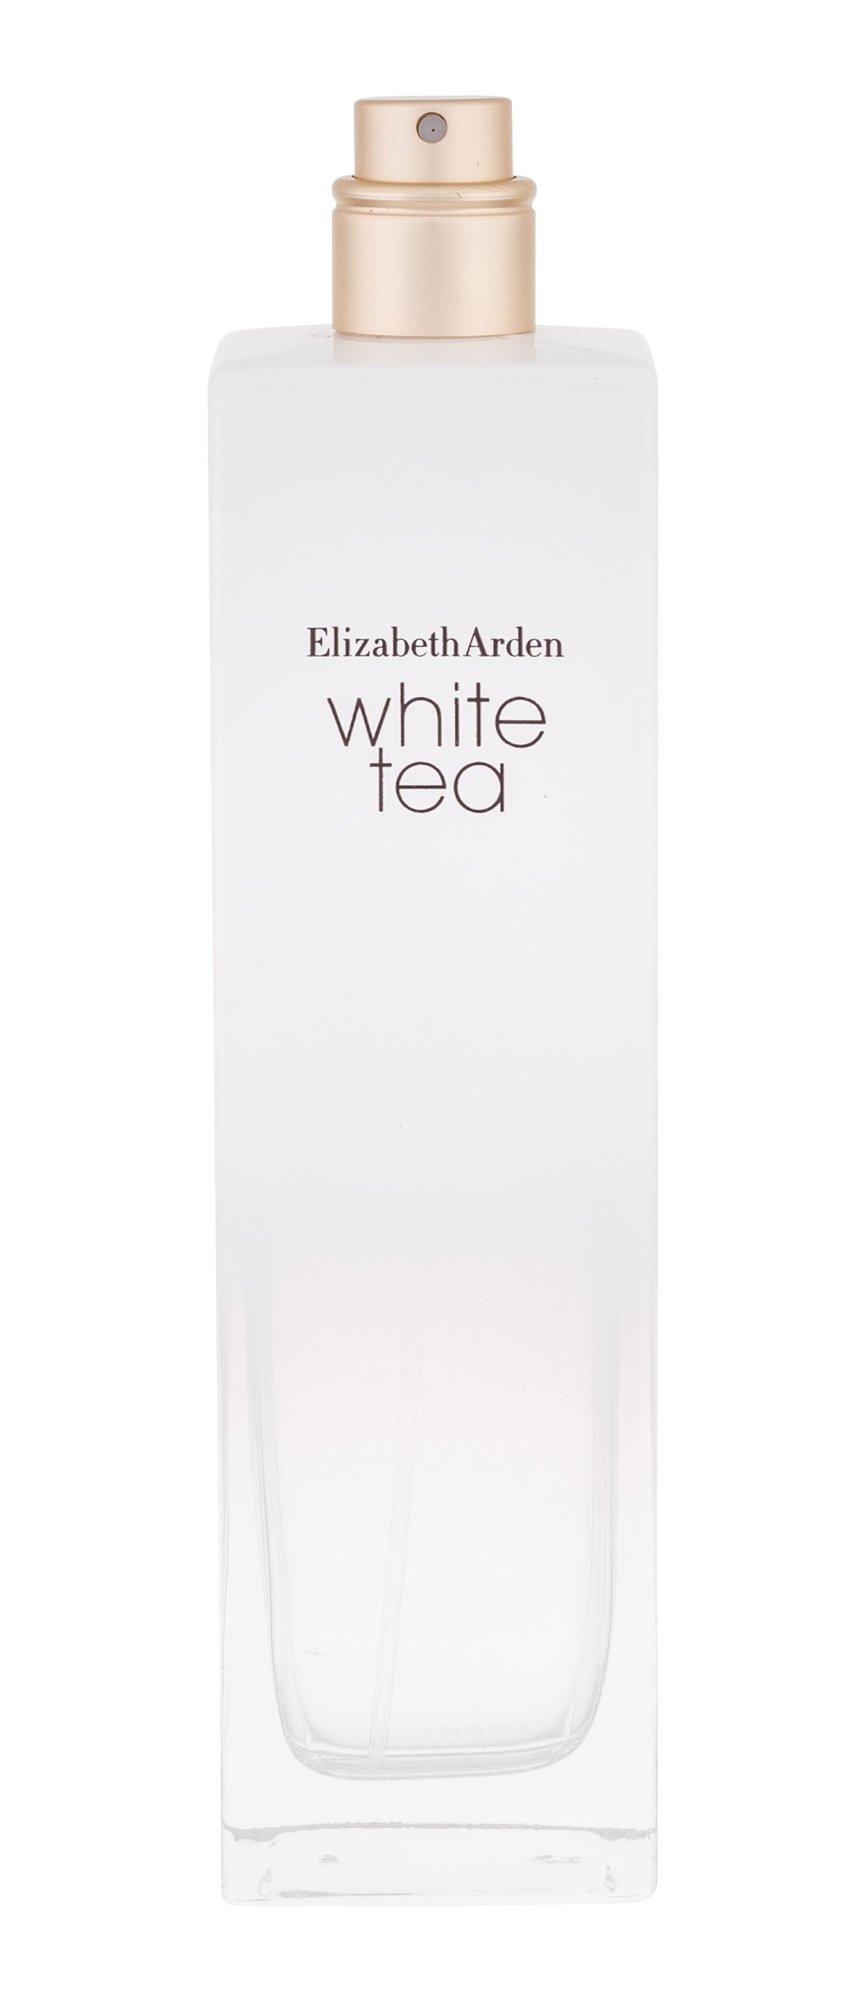 Elizabeth Arden White Tea, Toaletní voda 100ml, Tester